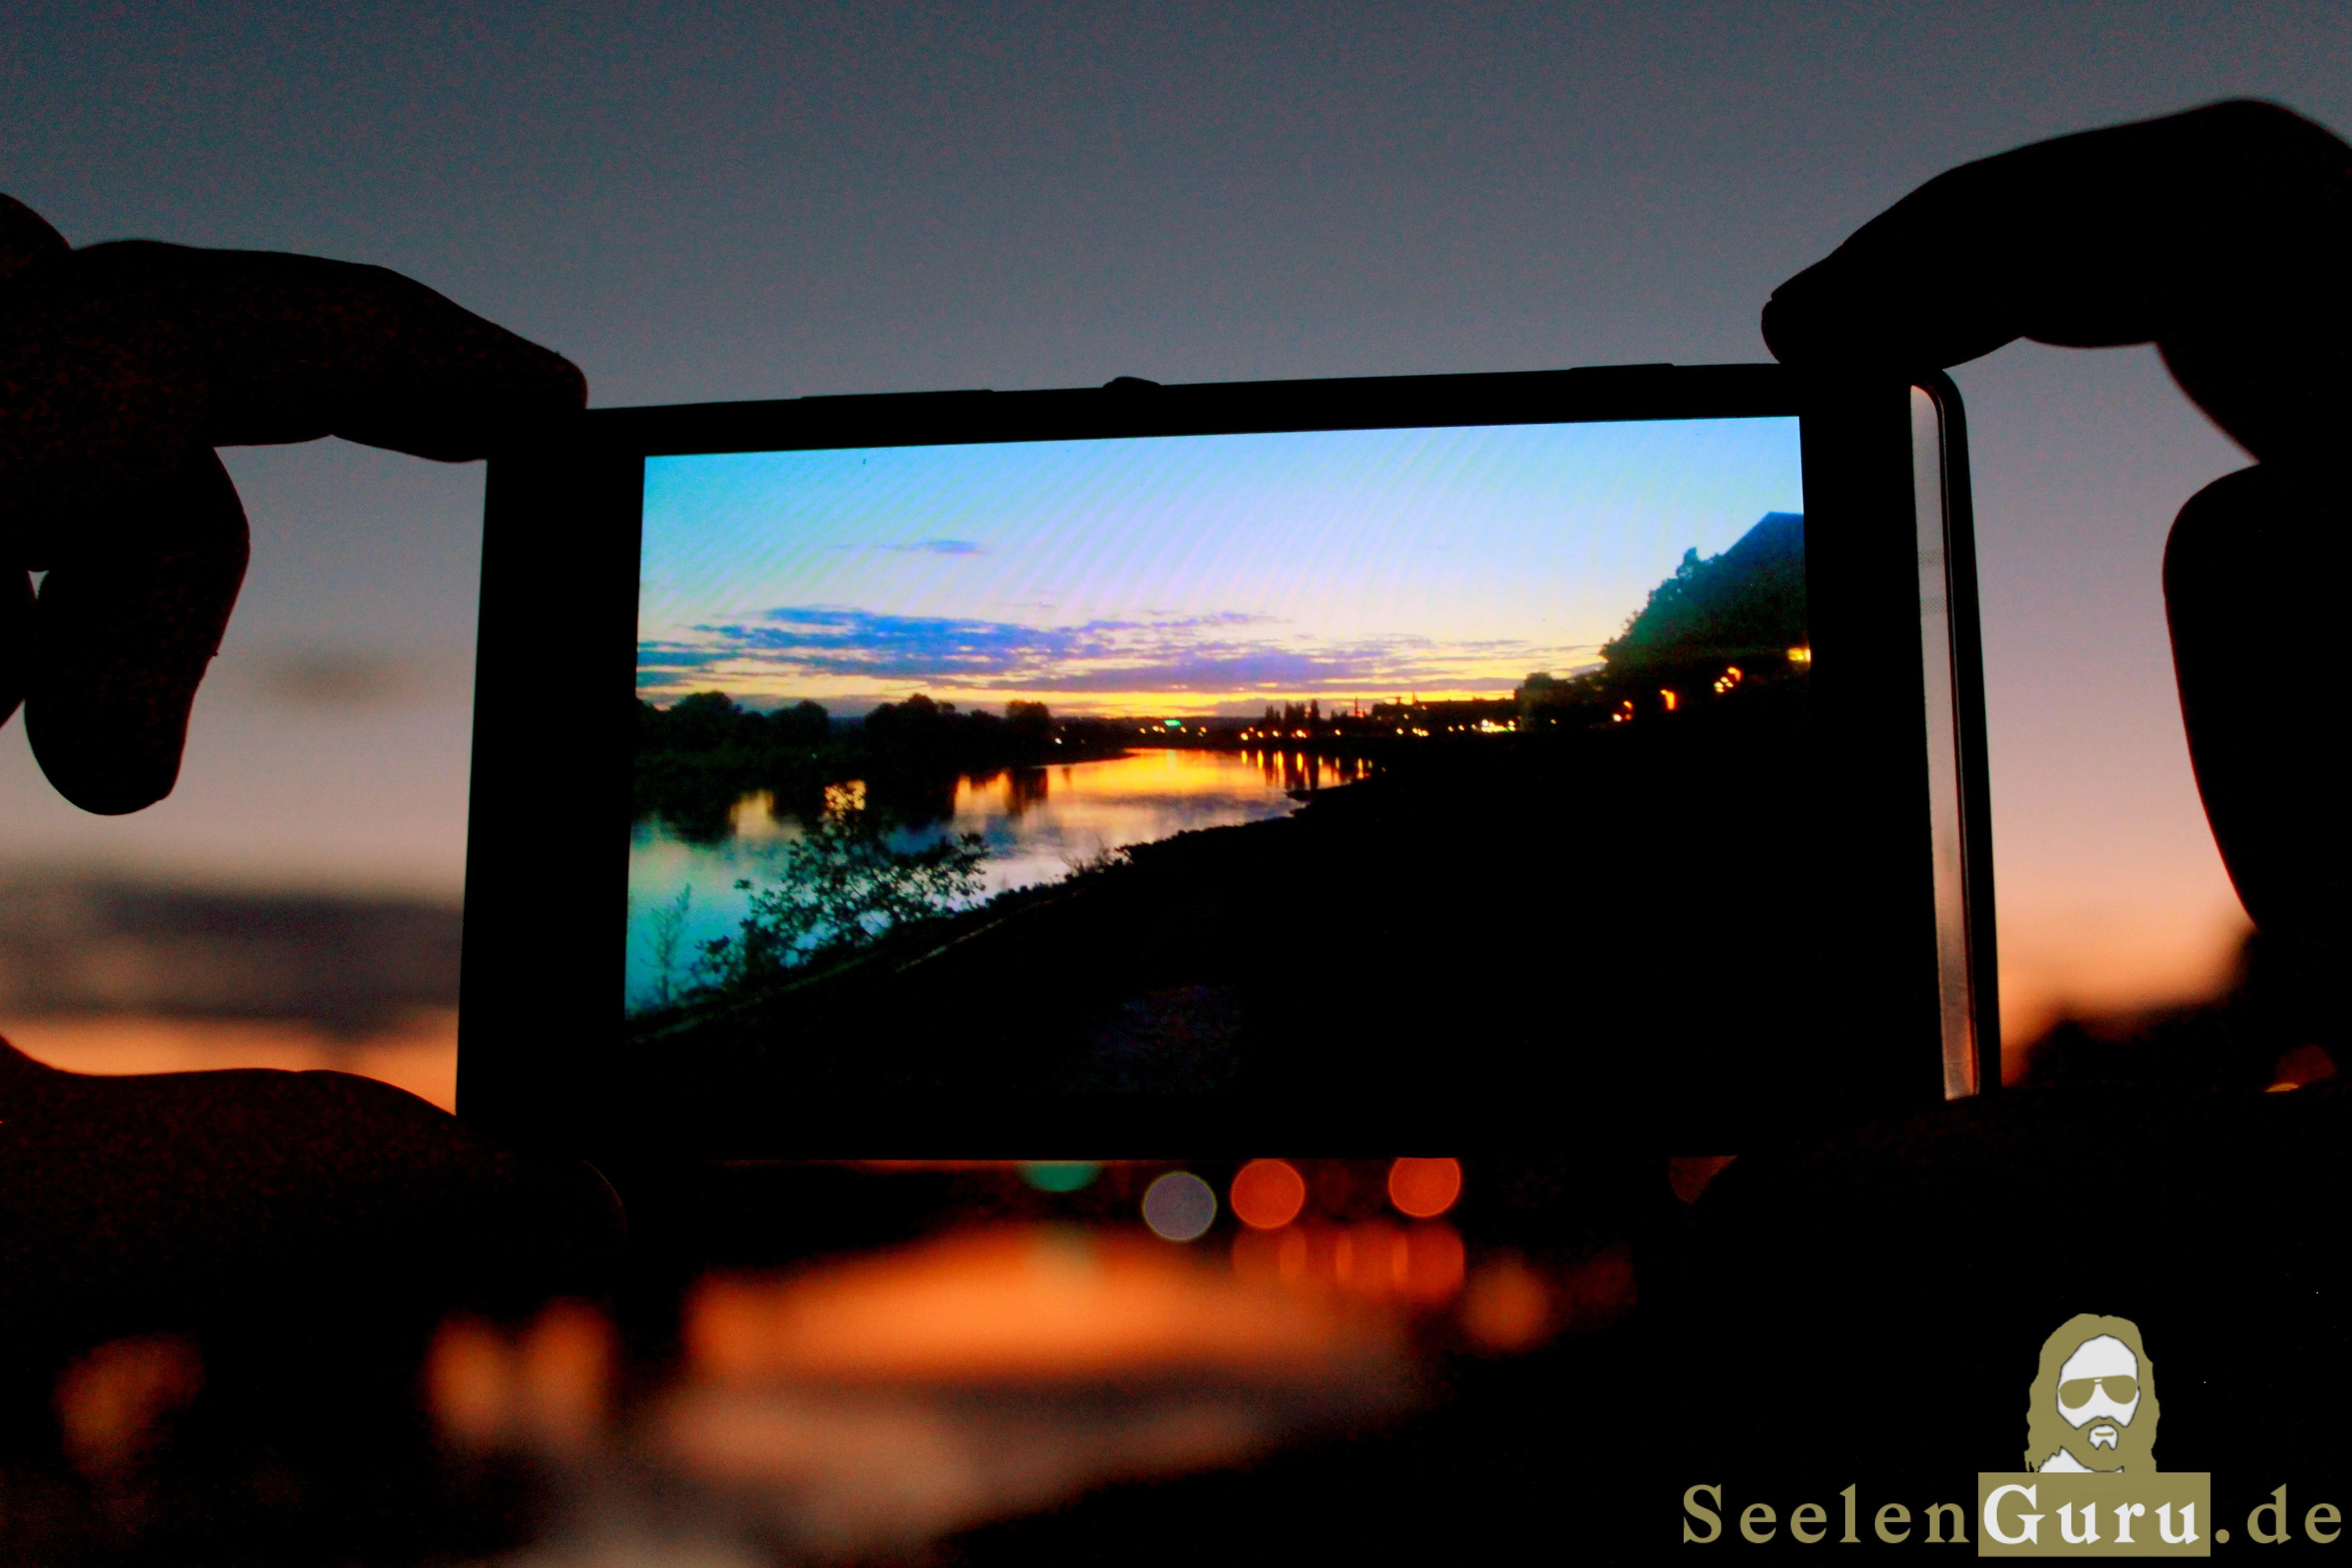 Sonnenuntergang in Dresden per Smartphone